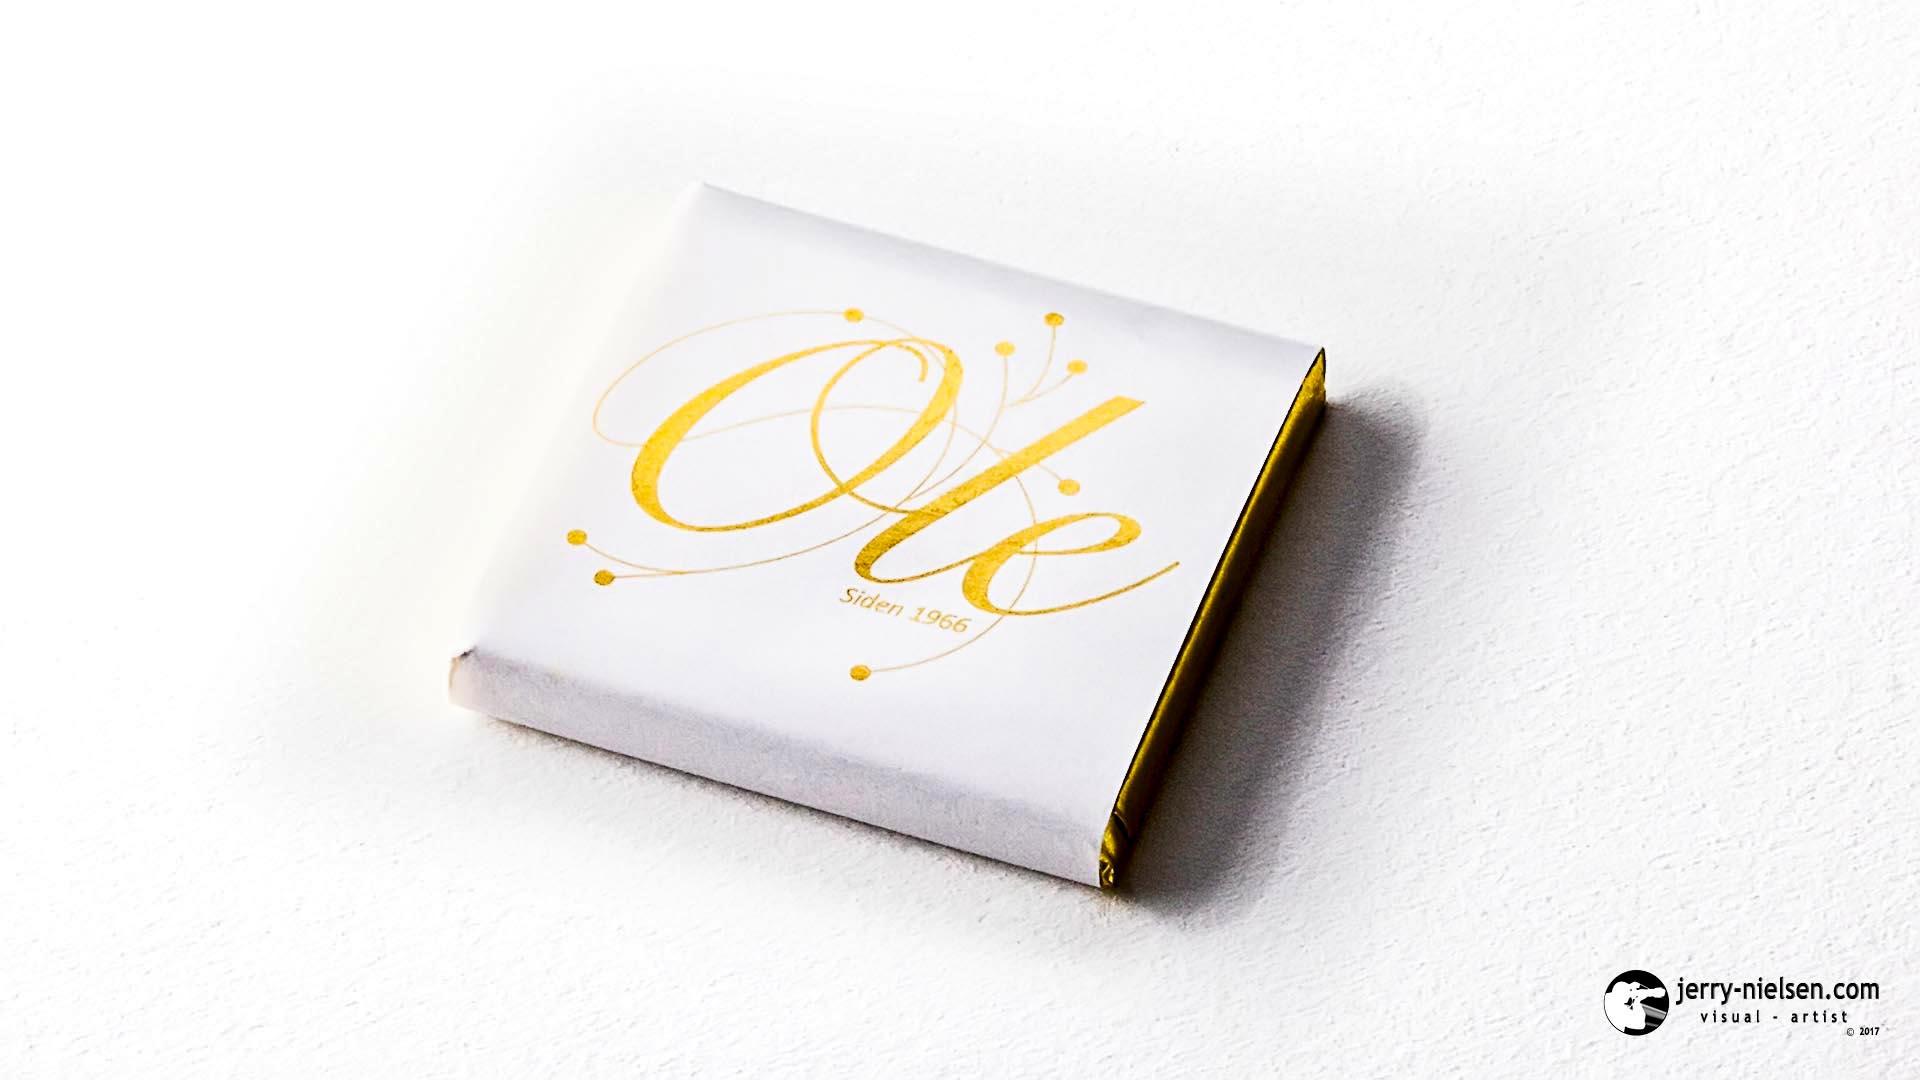 Ole Chokolade Small Chocolate Bar